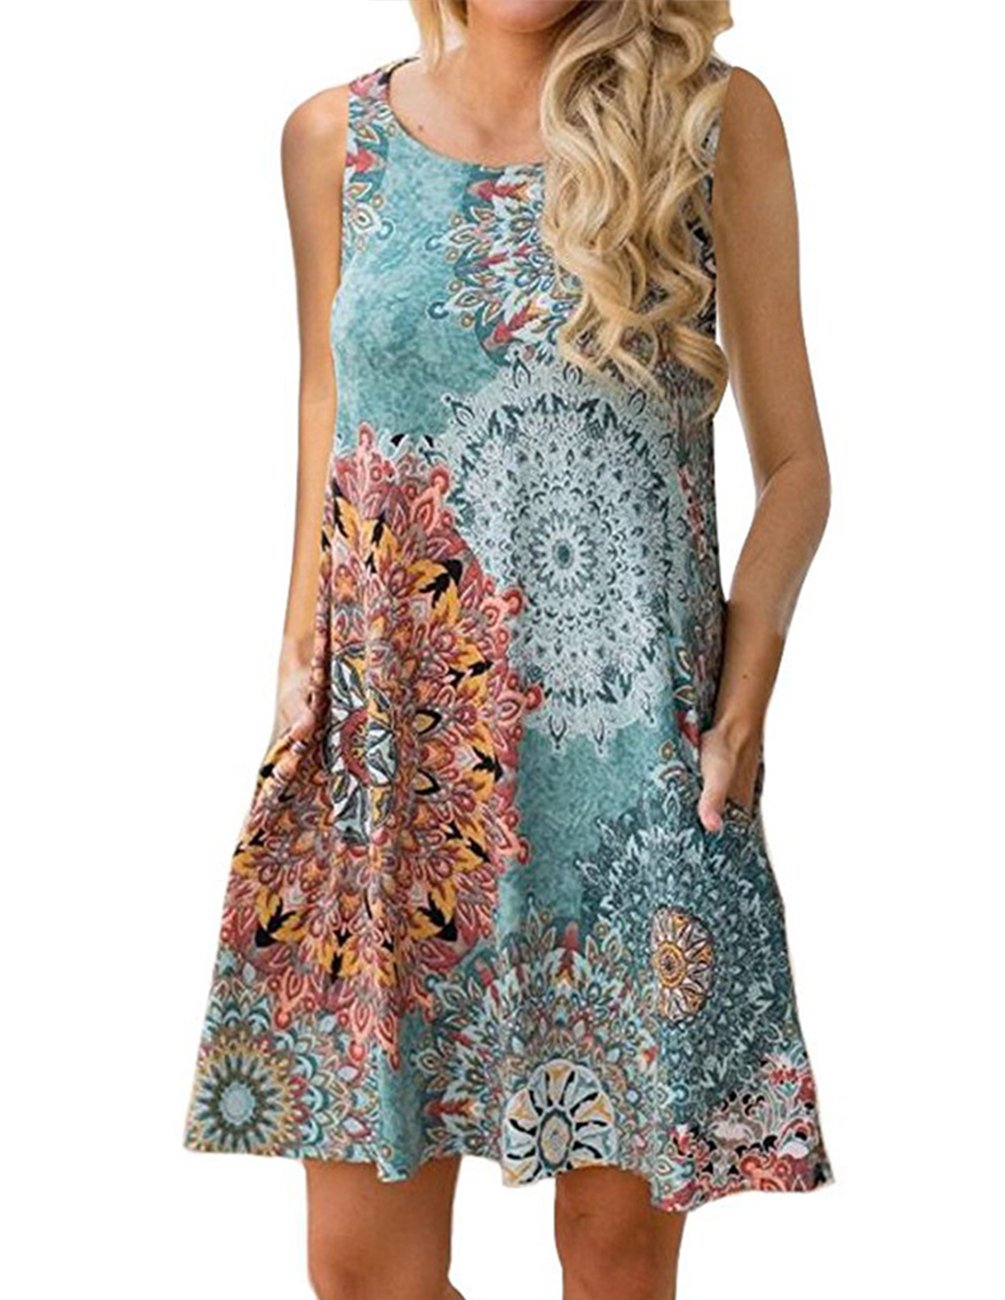 Buauty Women's Summer Boho Sleeveless Embroidered Hem Cotton Loose Casual Tank Dress